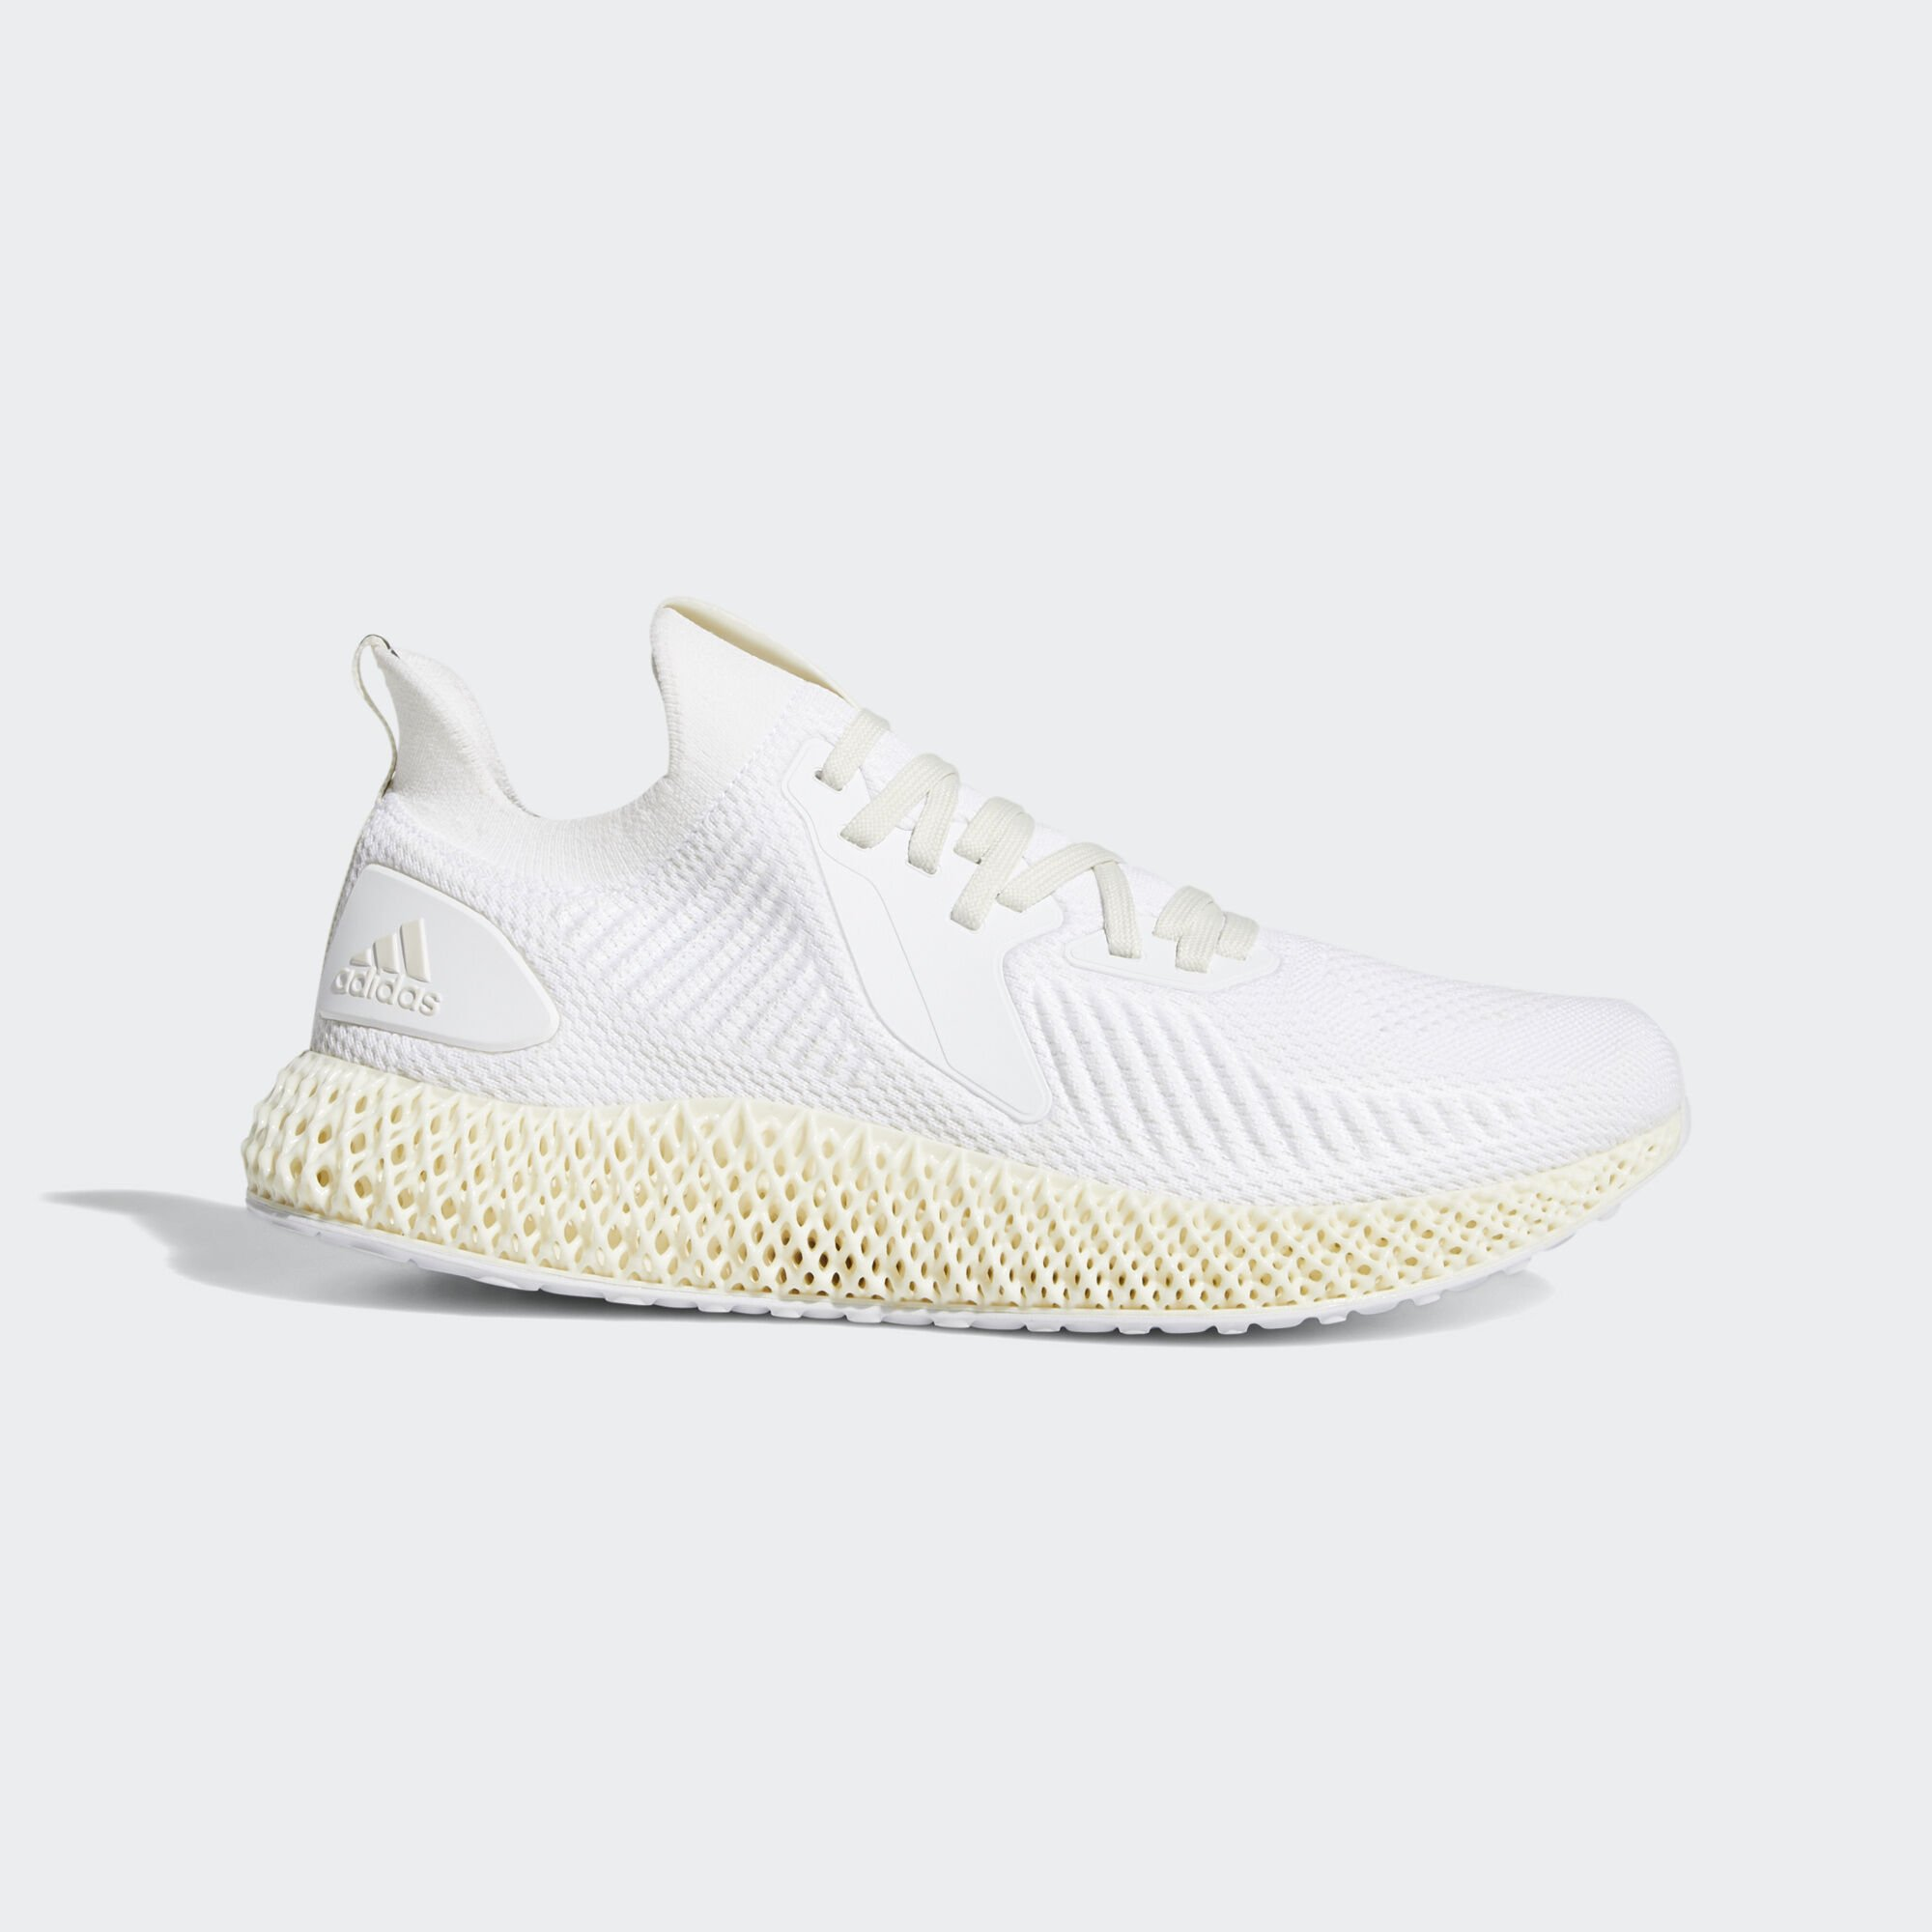 Adidas Alphaedge 4D Ftwr White Off White Pearl Grey (EF3455)